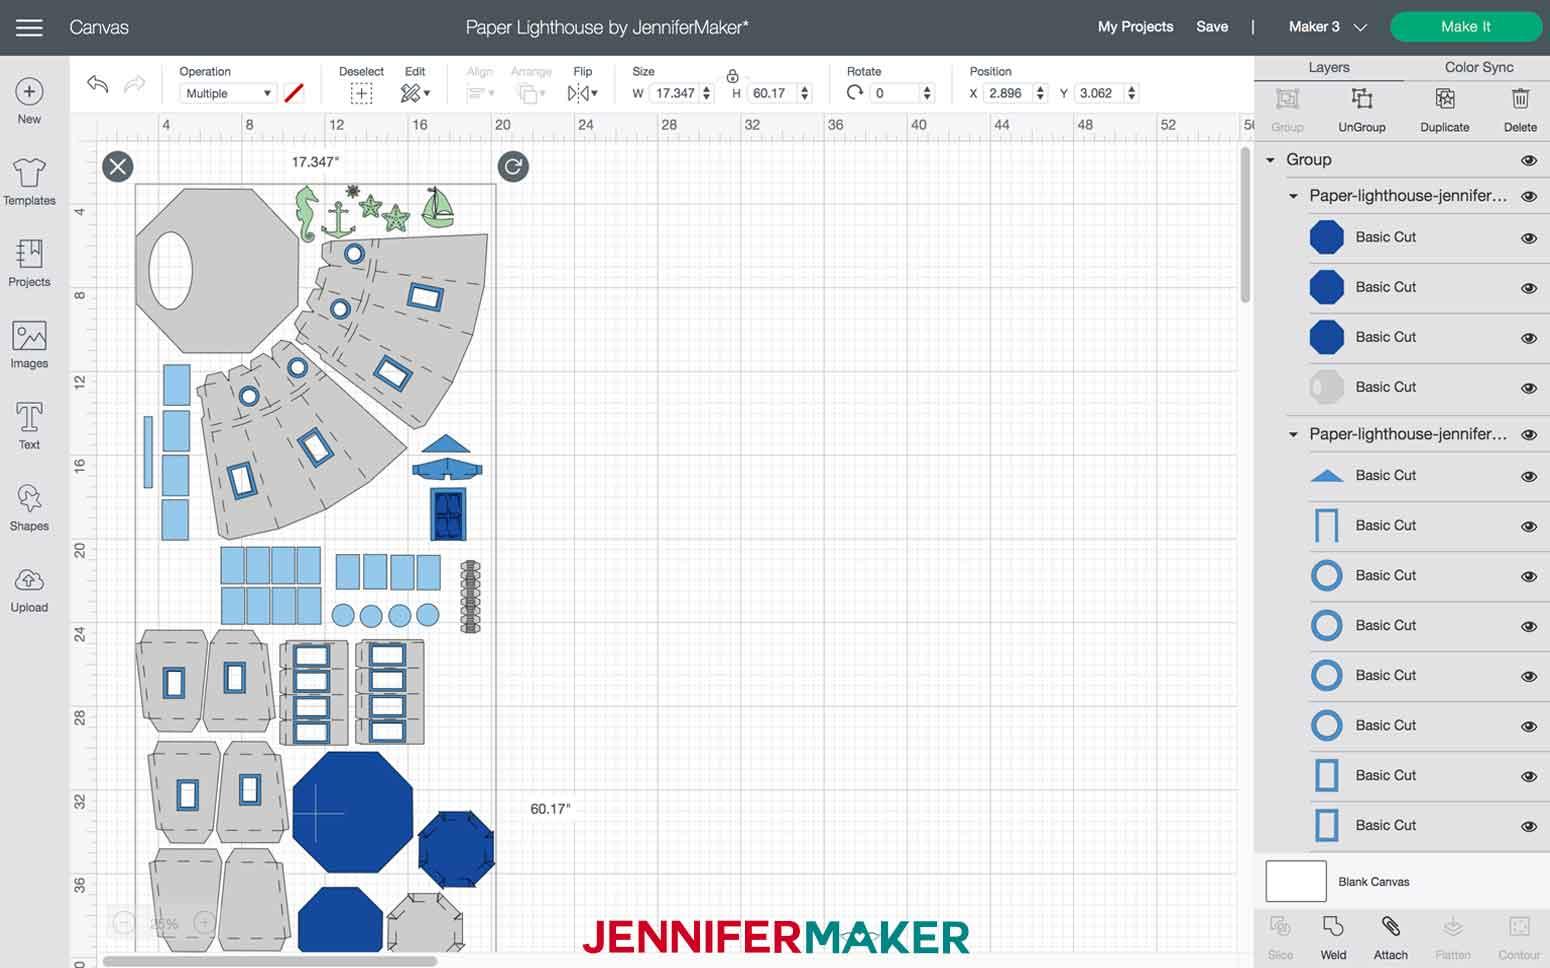 upload-paper-lighthouse-svg-to-design-space